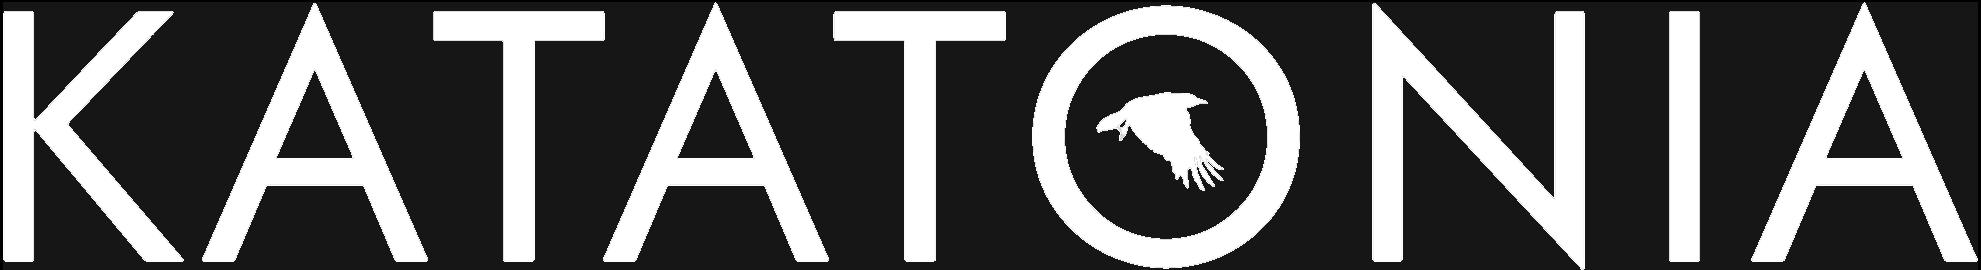 Katatonia - Logo